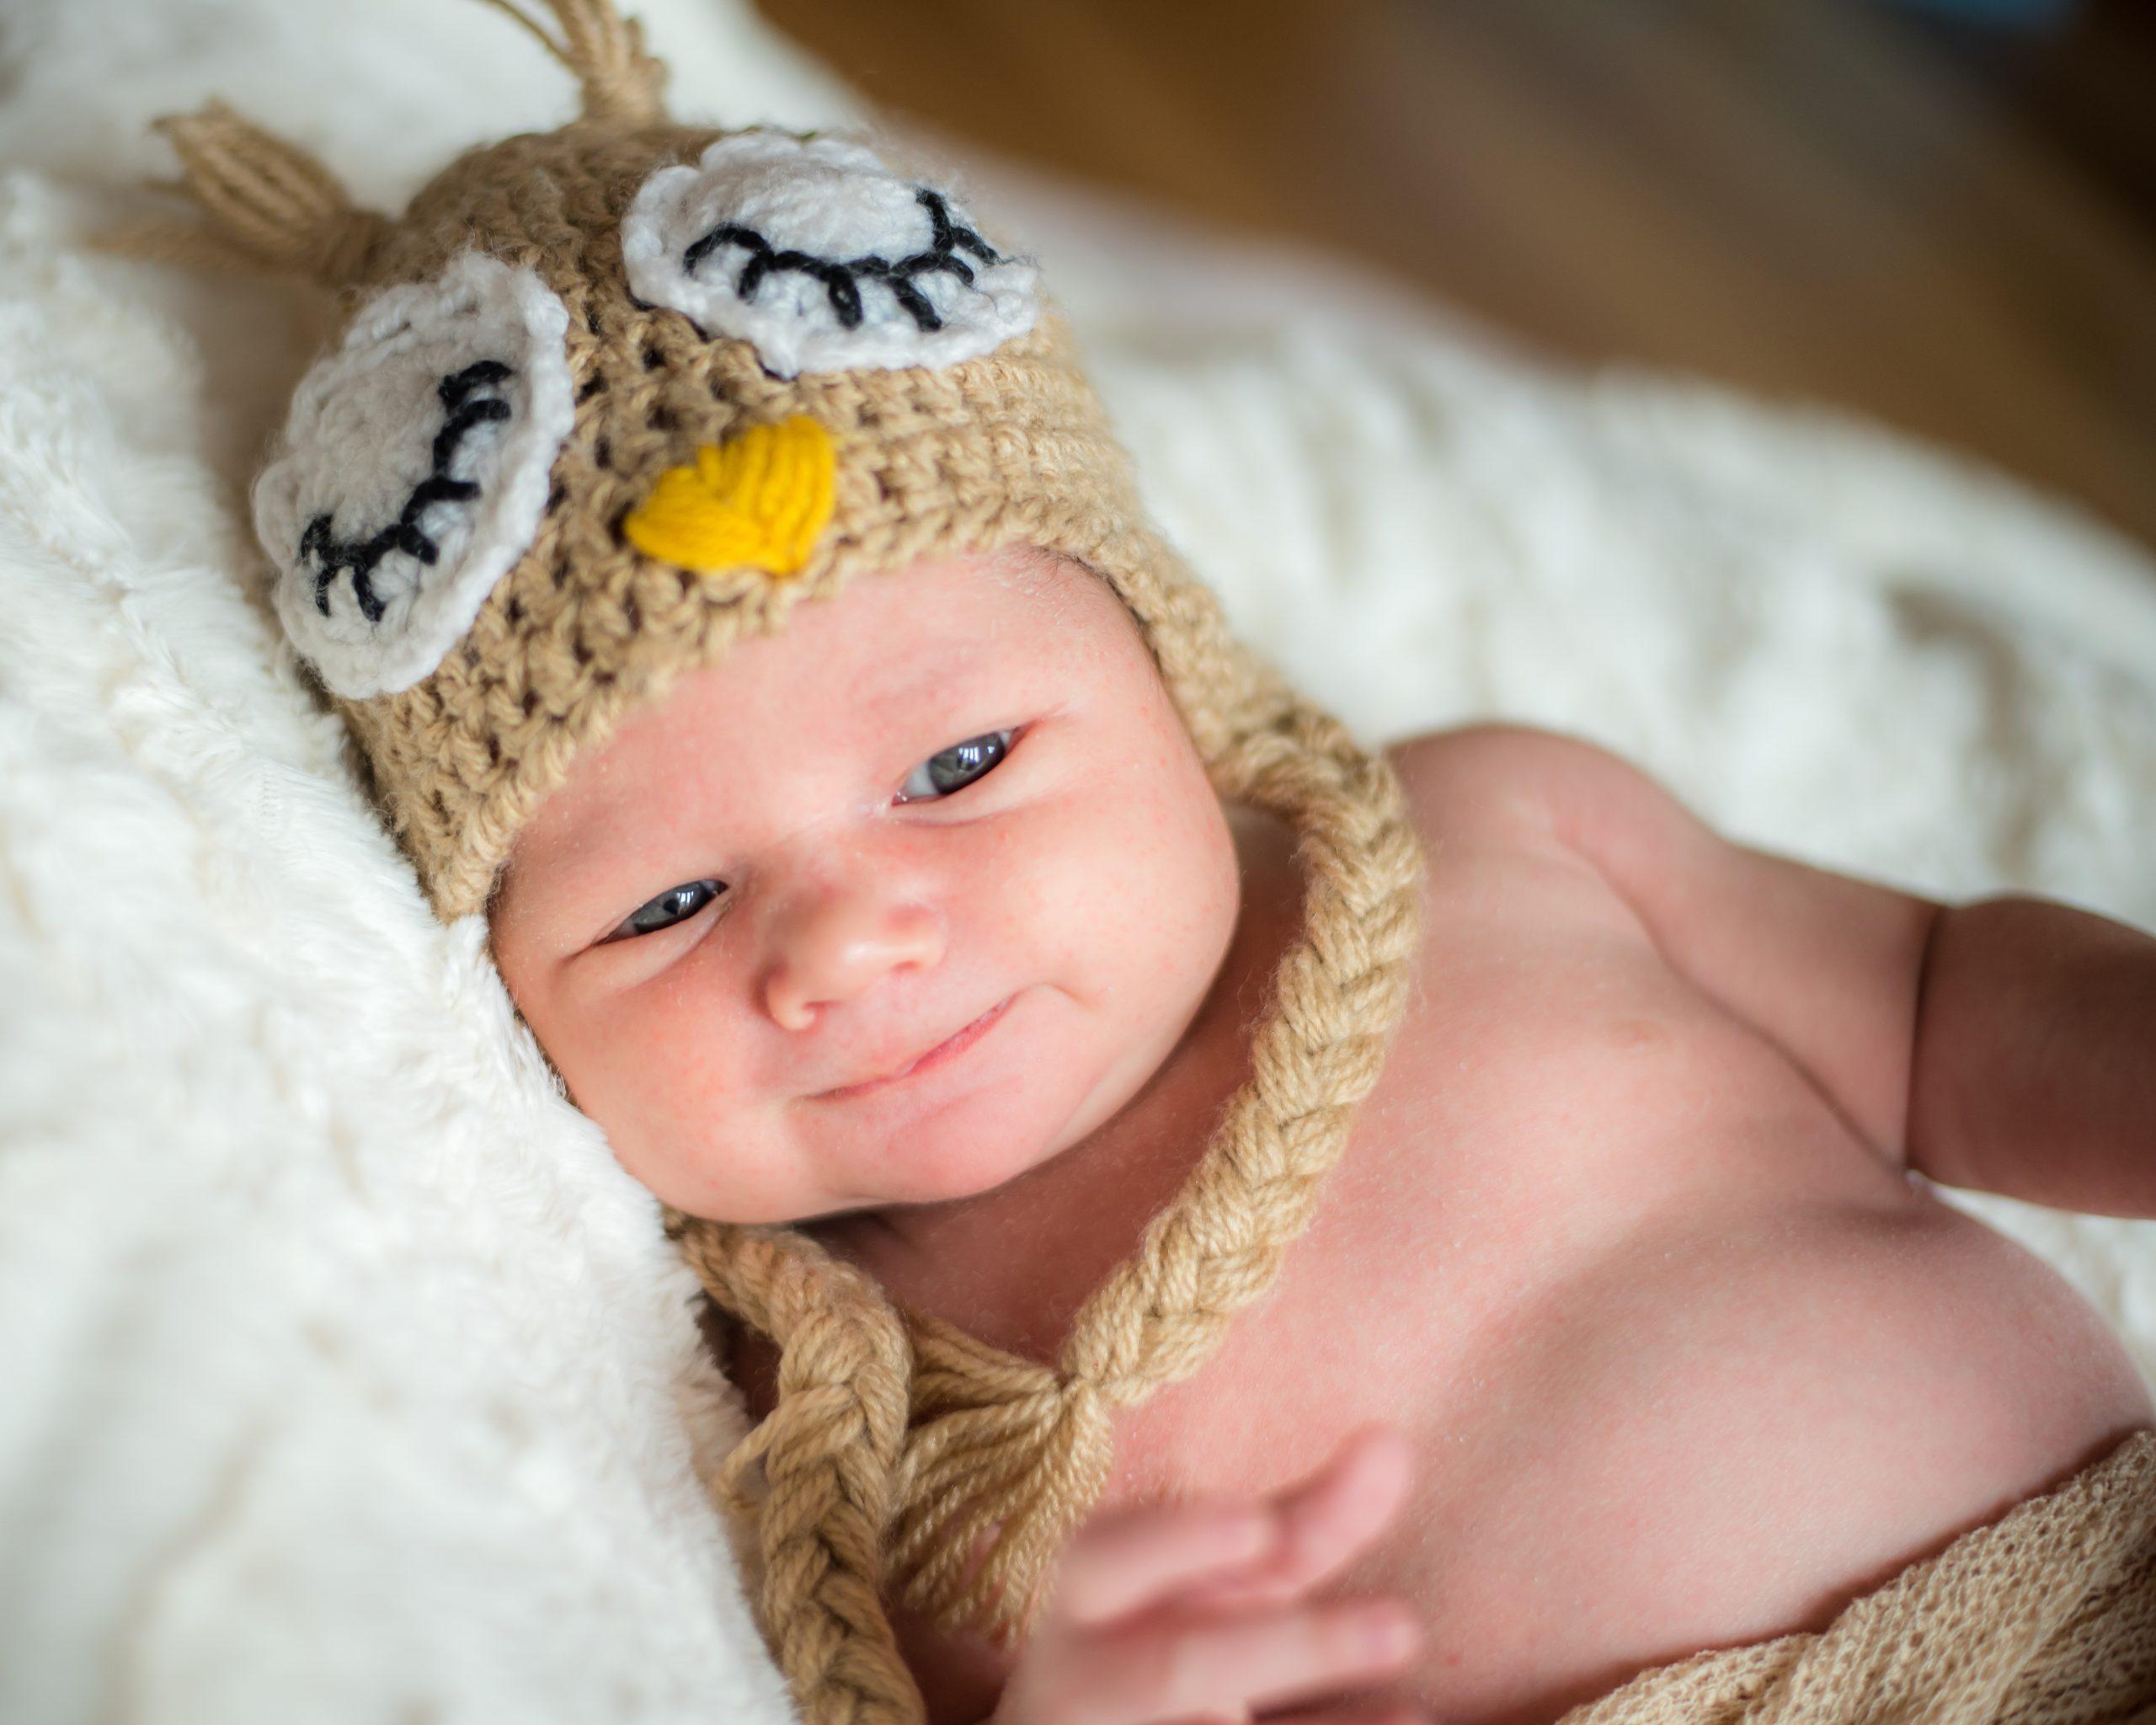 cumbria baby photography